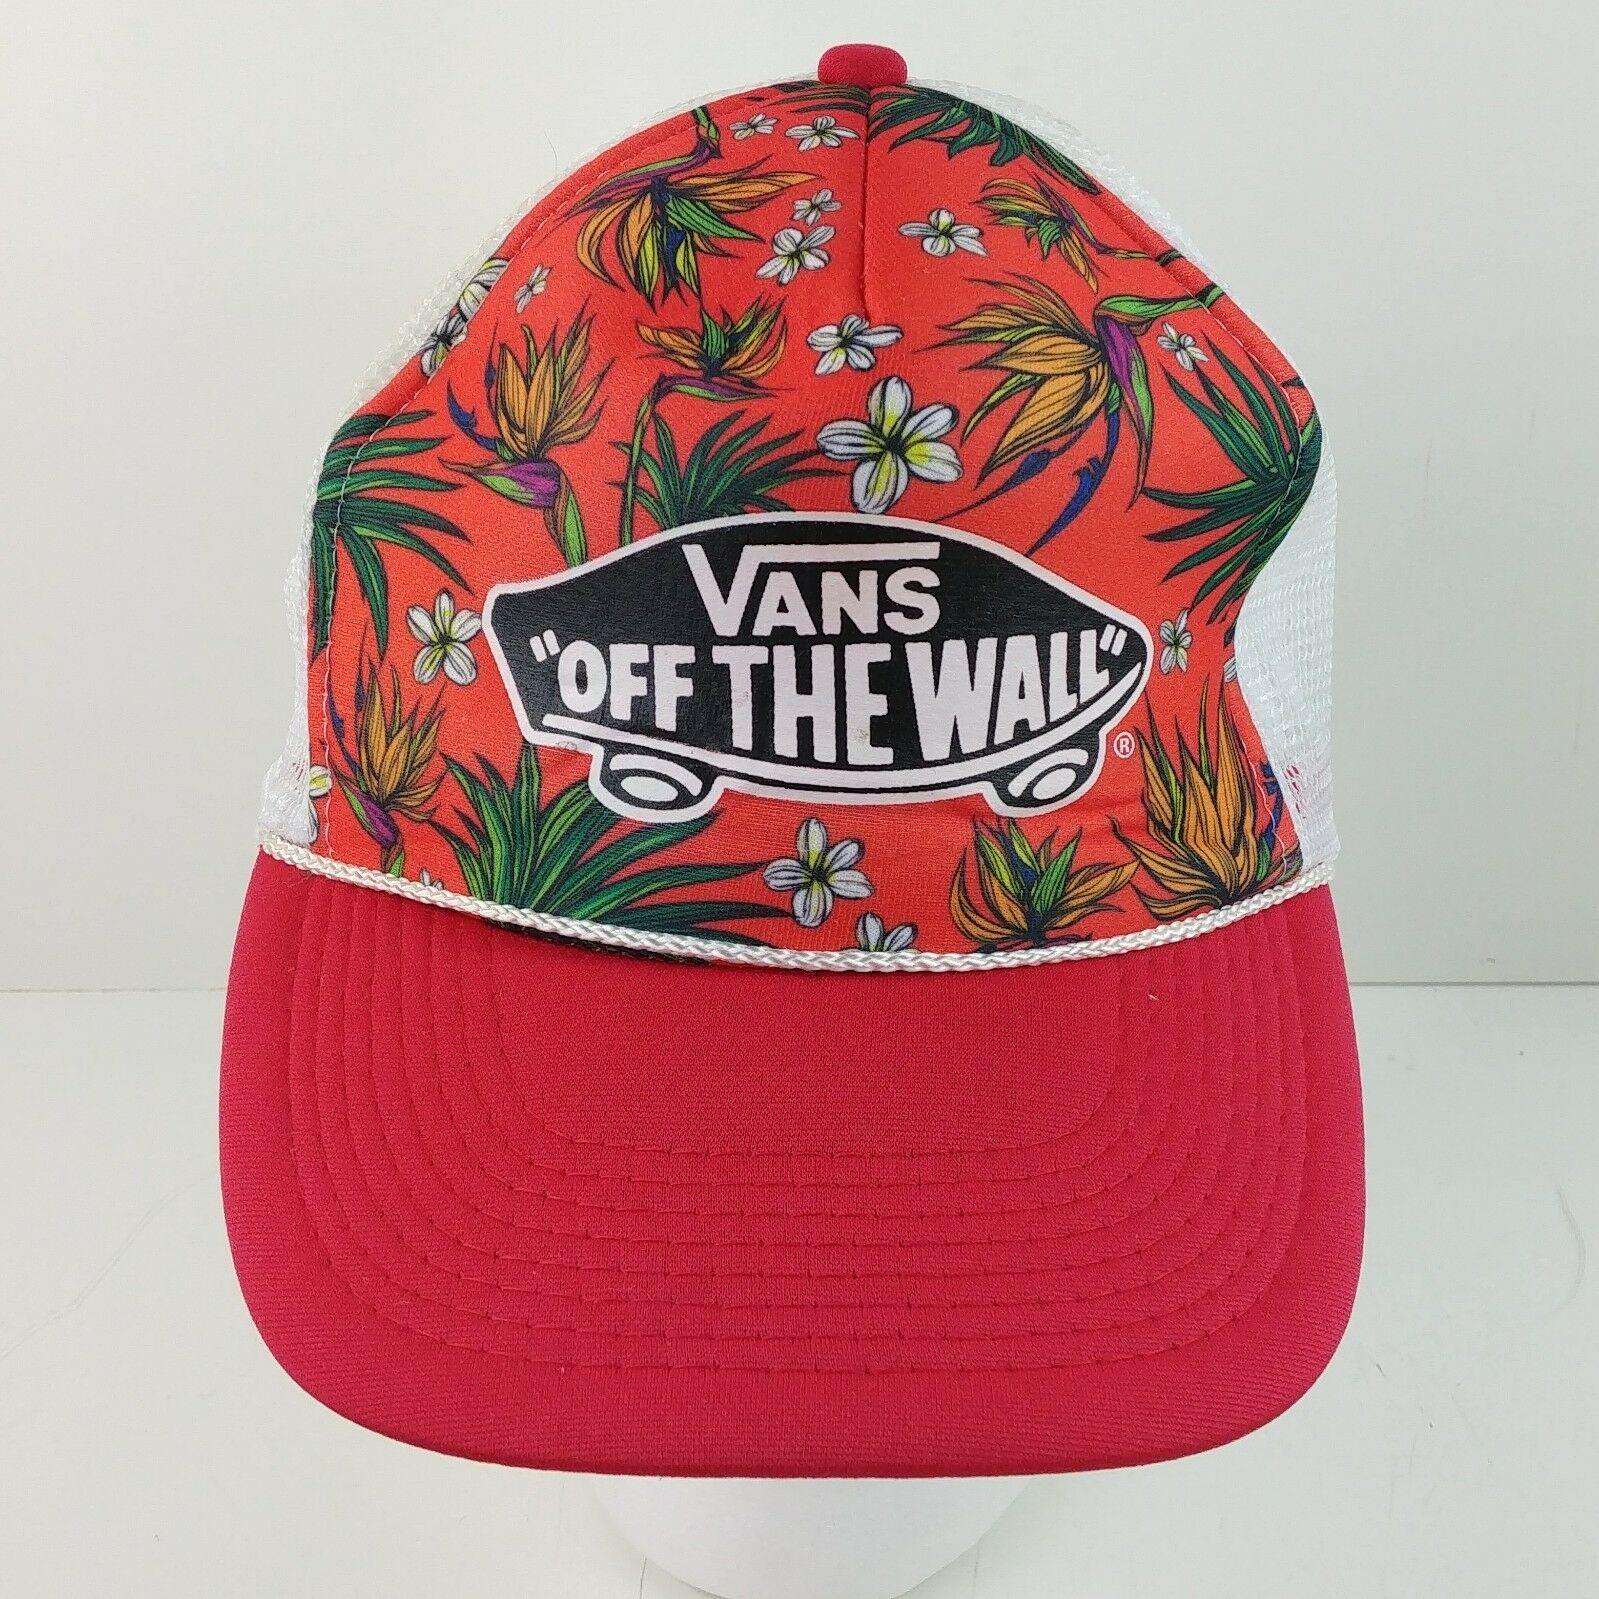 745daf9f1db Vans Off The Wall Red Floral Skateboard Logo Cap Hat Snapback ...